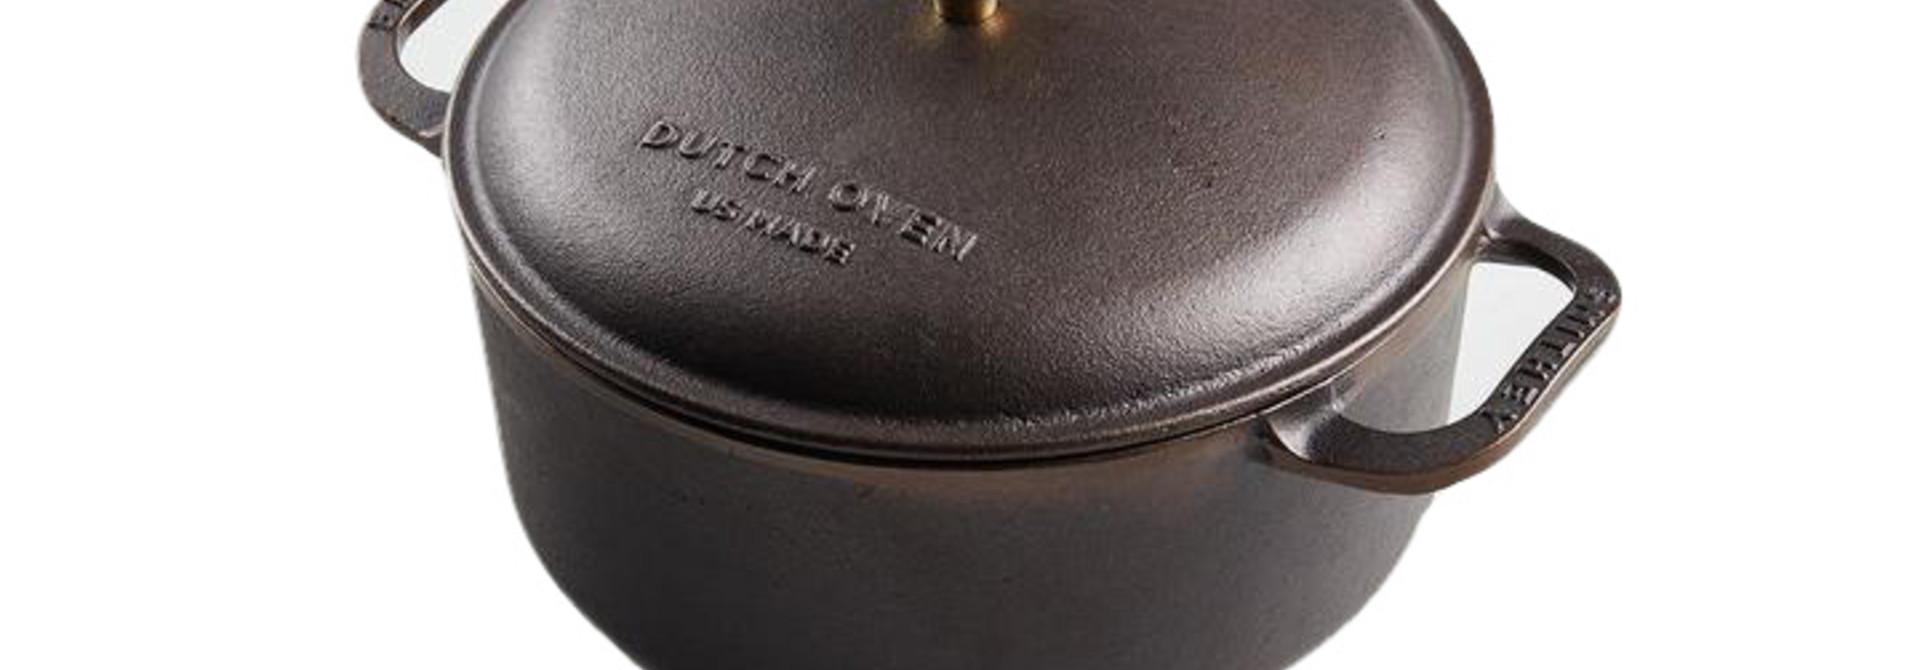 3.5 QT Dutch Oven, Smithey